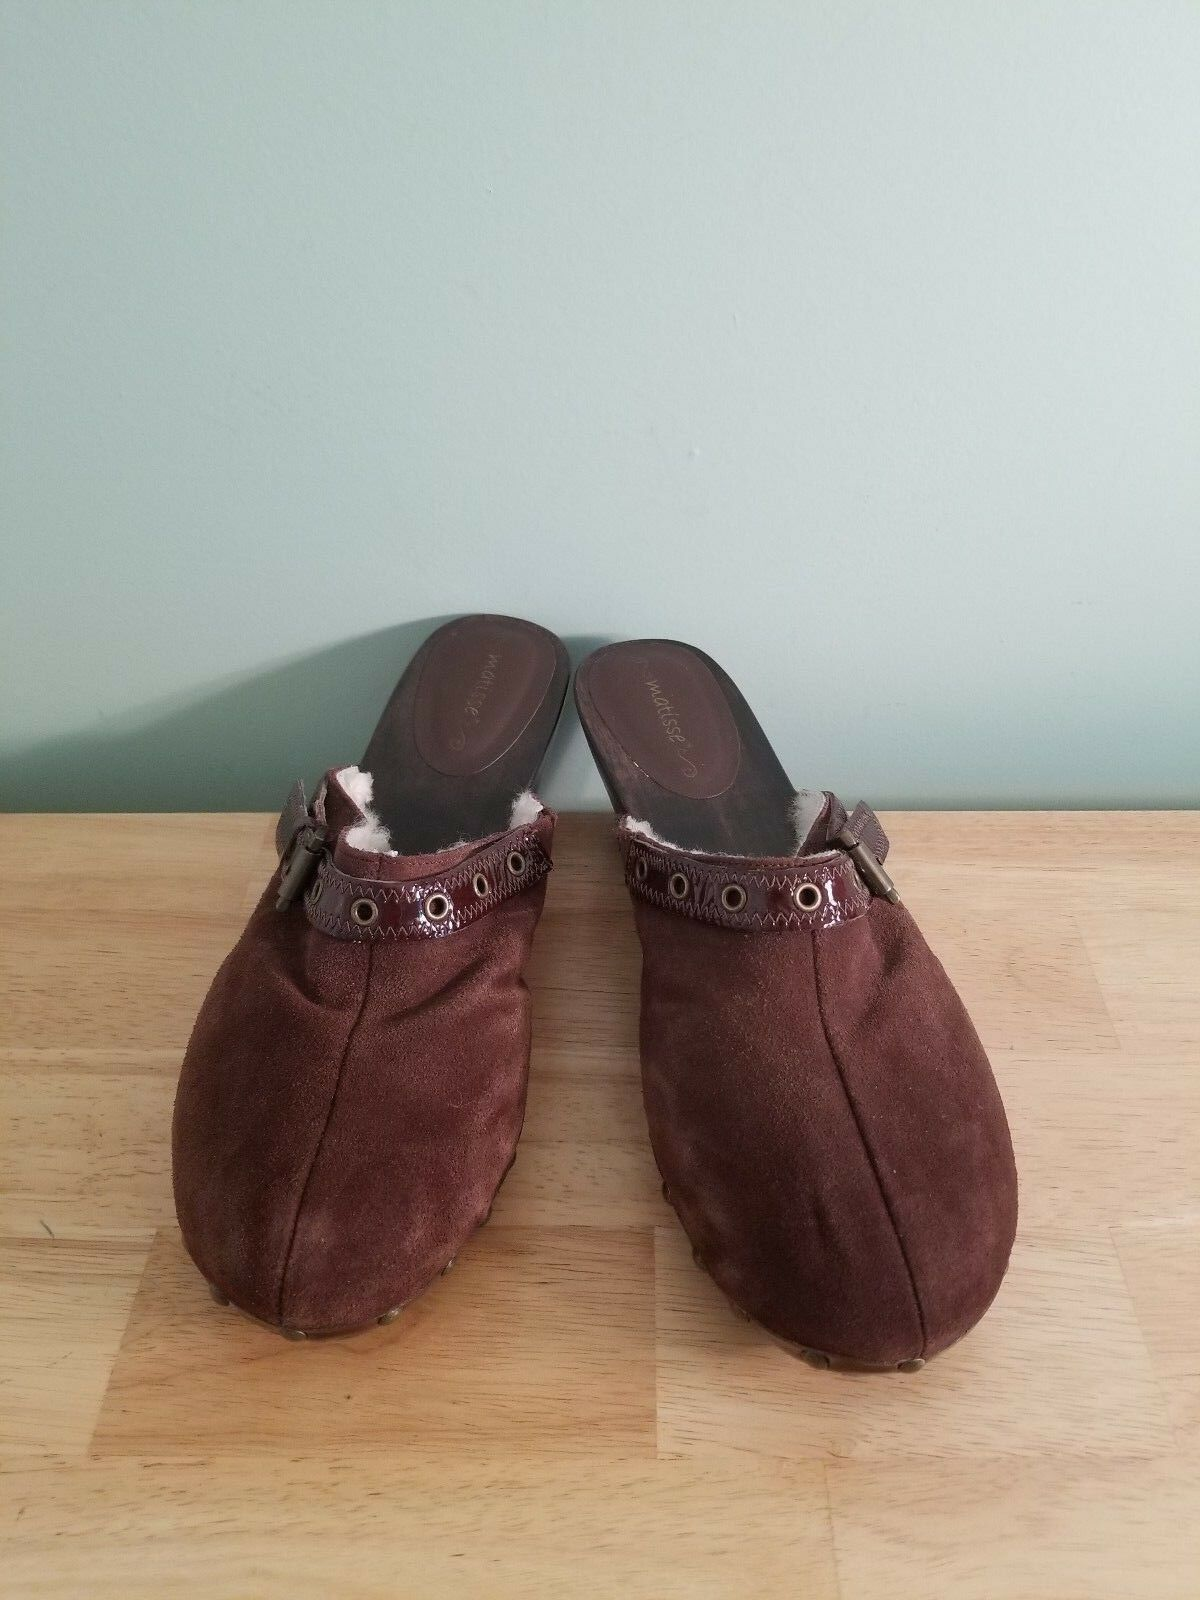 Matisse Brown Suede Clogs Mules Sheepskin Interior Size 10